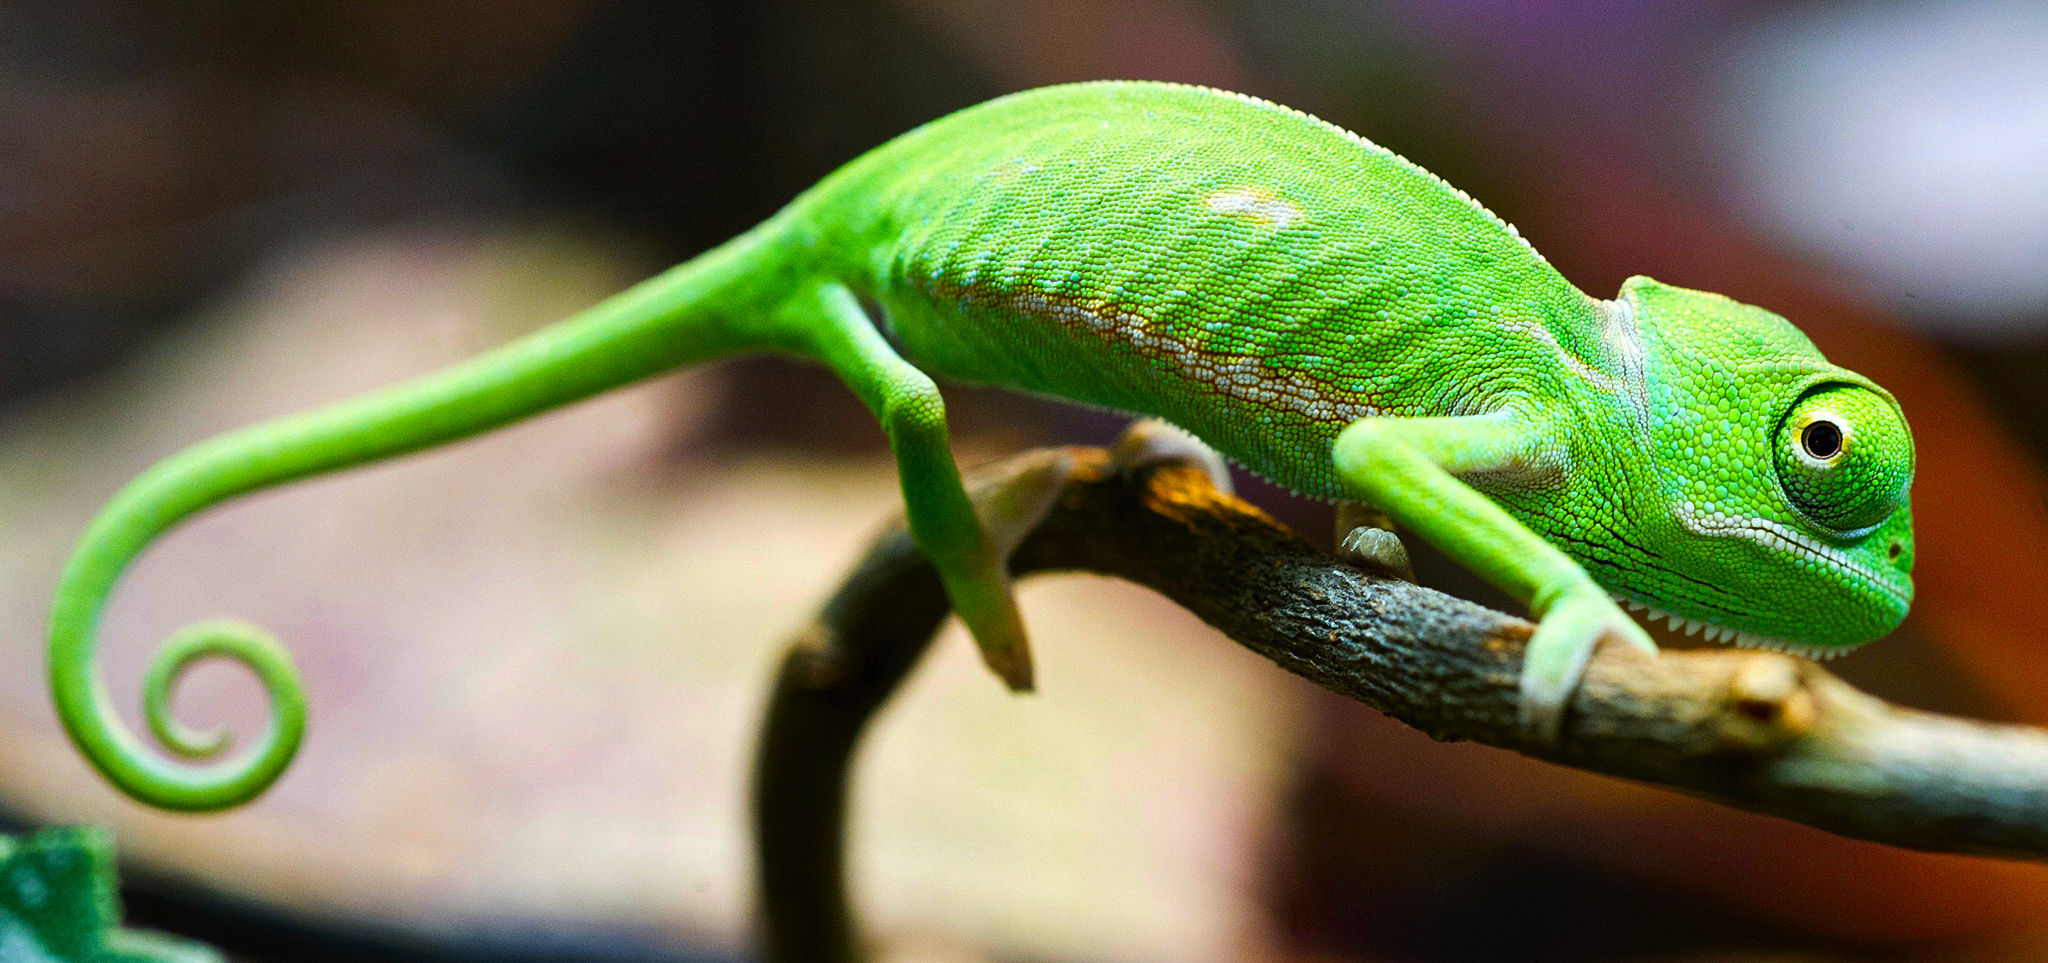 Chameleon HD wallpapers, Desktop wallpaper - most viewed